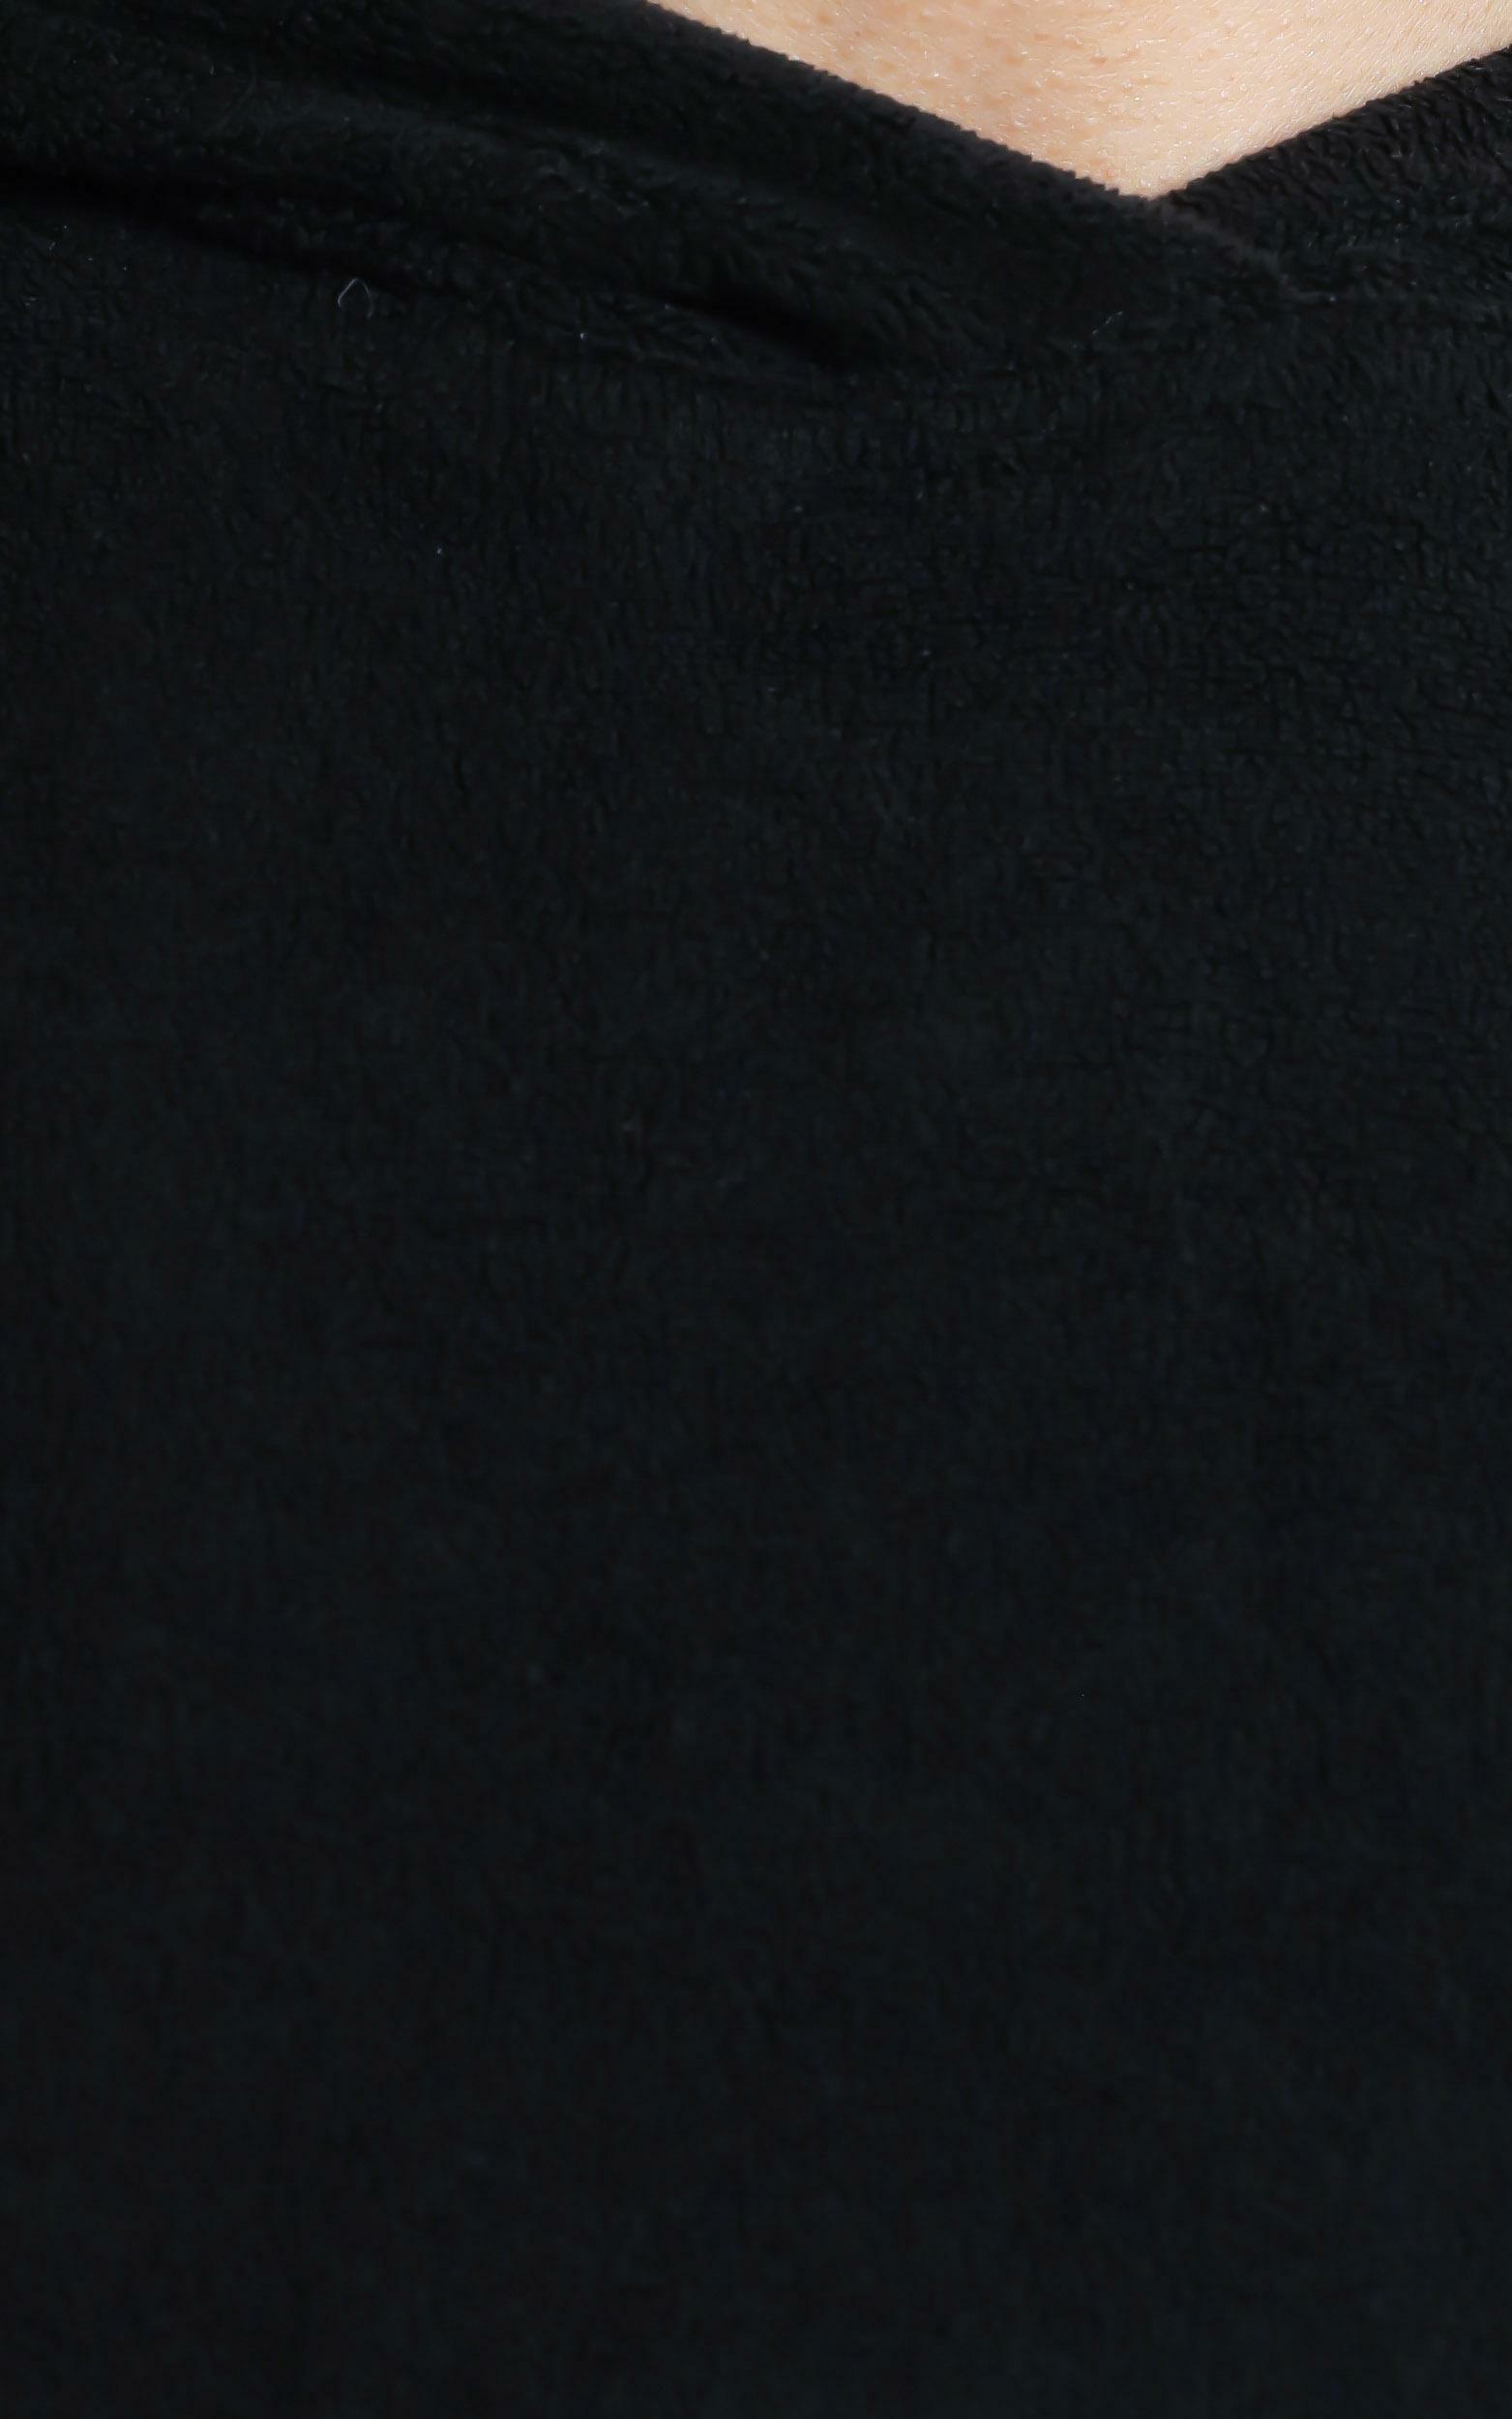 Lorensa Top in Black - 12 (L), Black, hi-res image number null